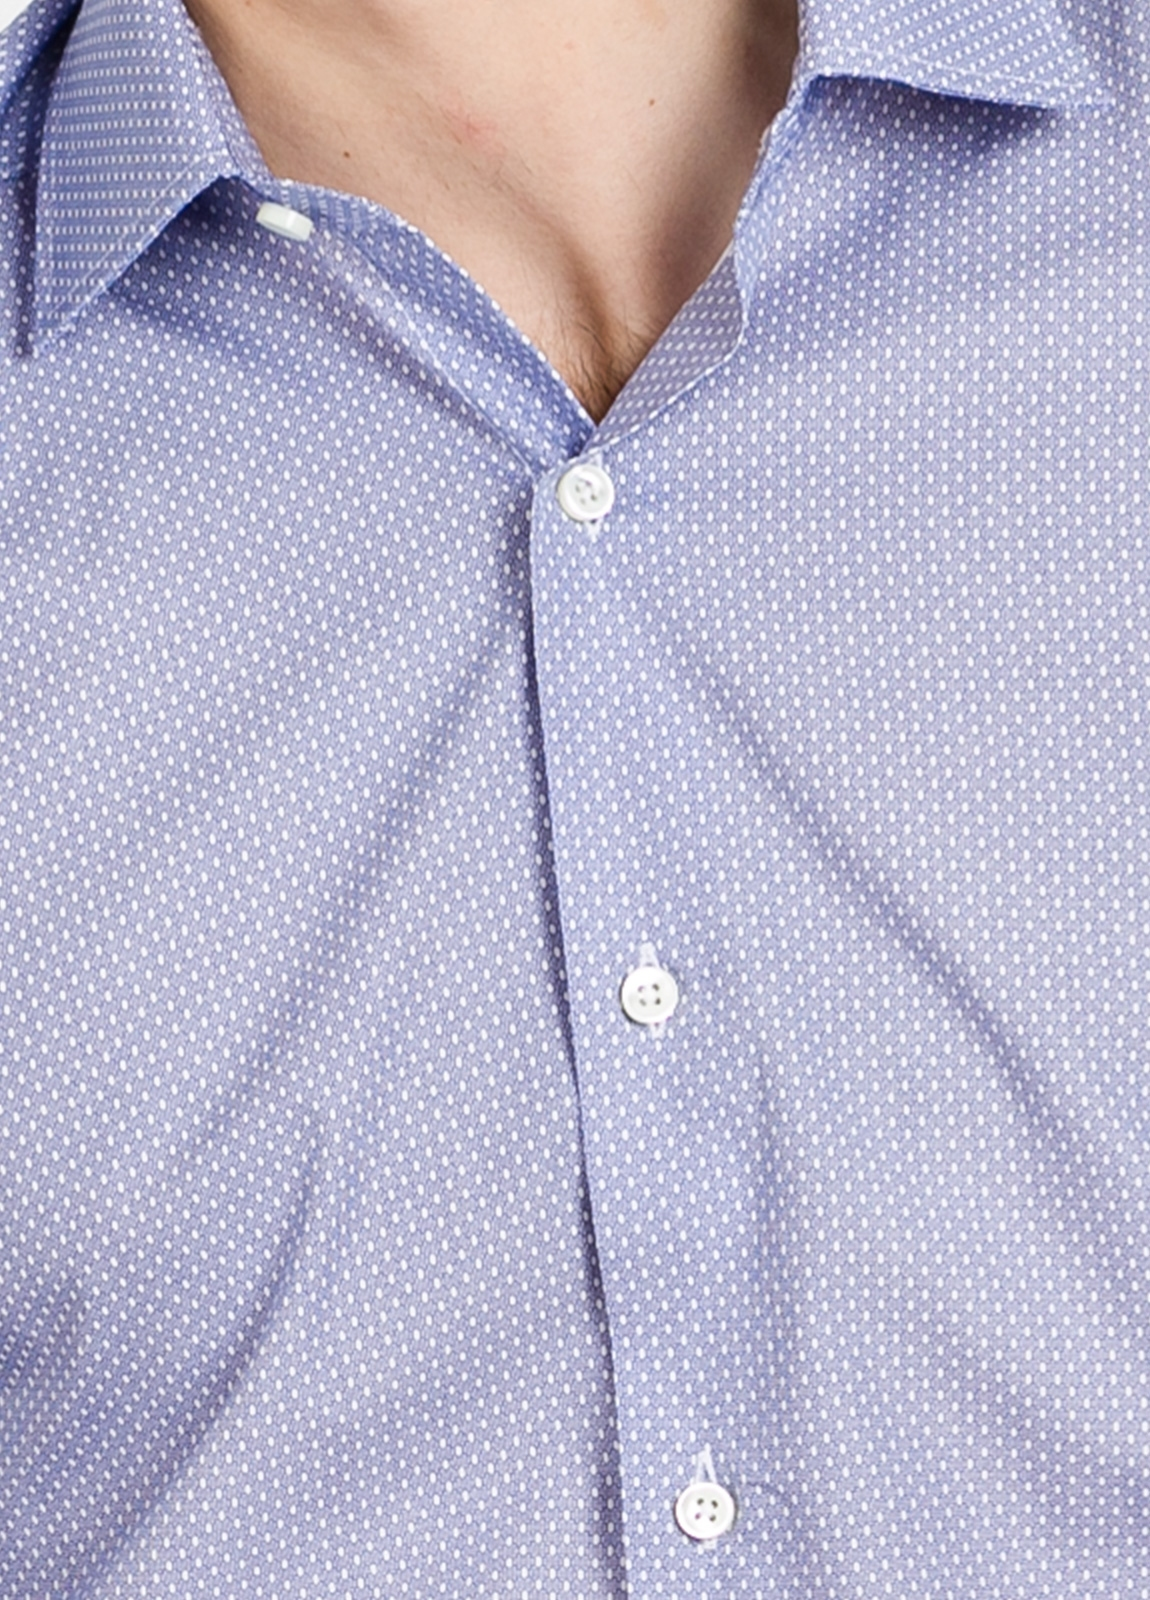 Camisa Formal Wear SLIM FIT cuello italiano modelo ROMA microdibujo color azul. 100% Algodón. - Ítem1